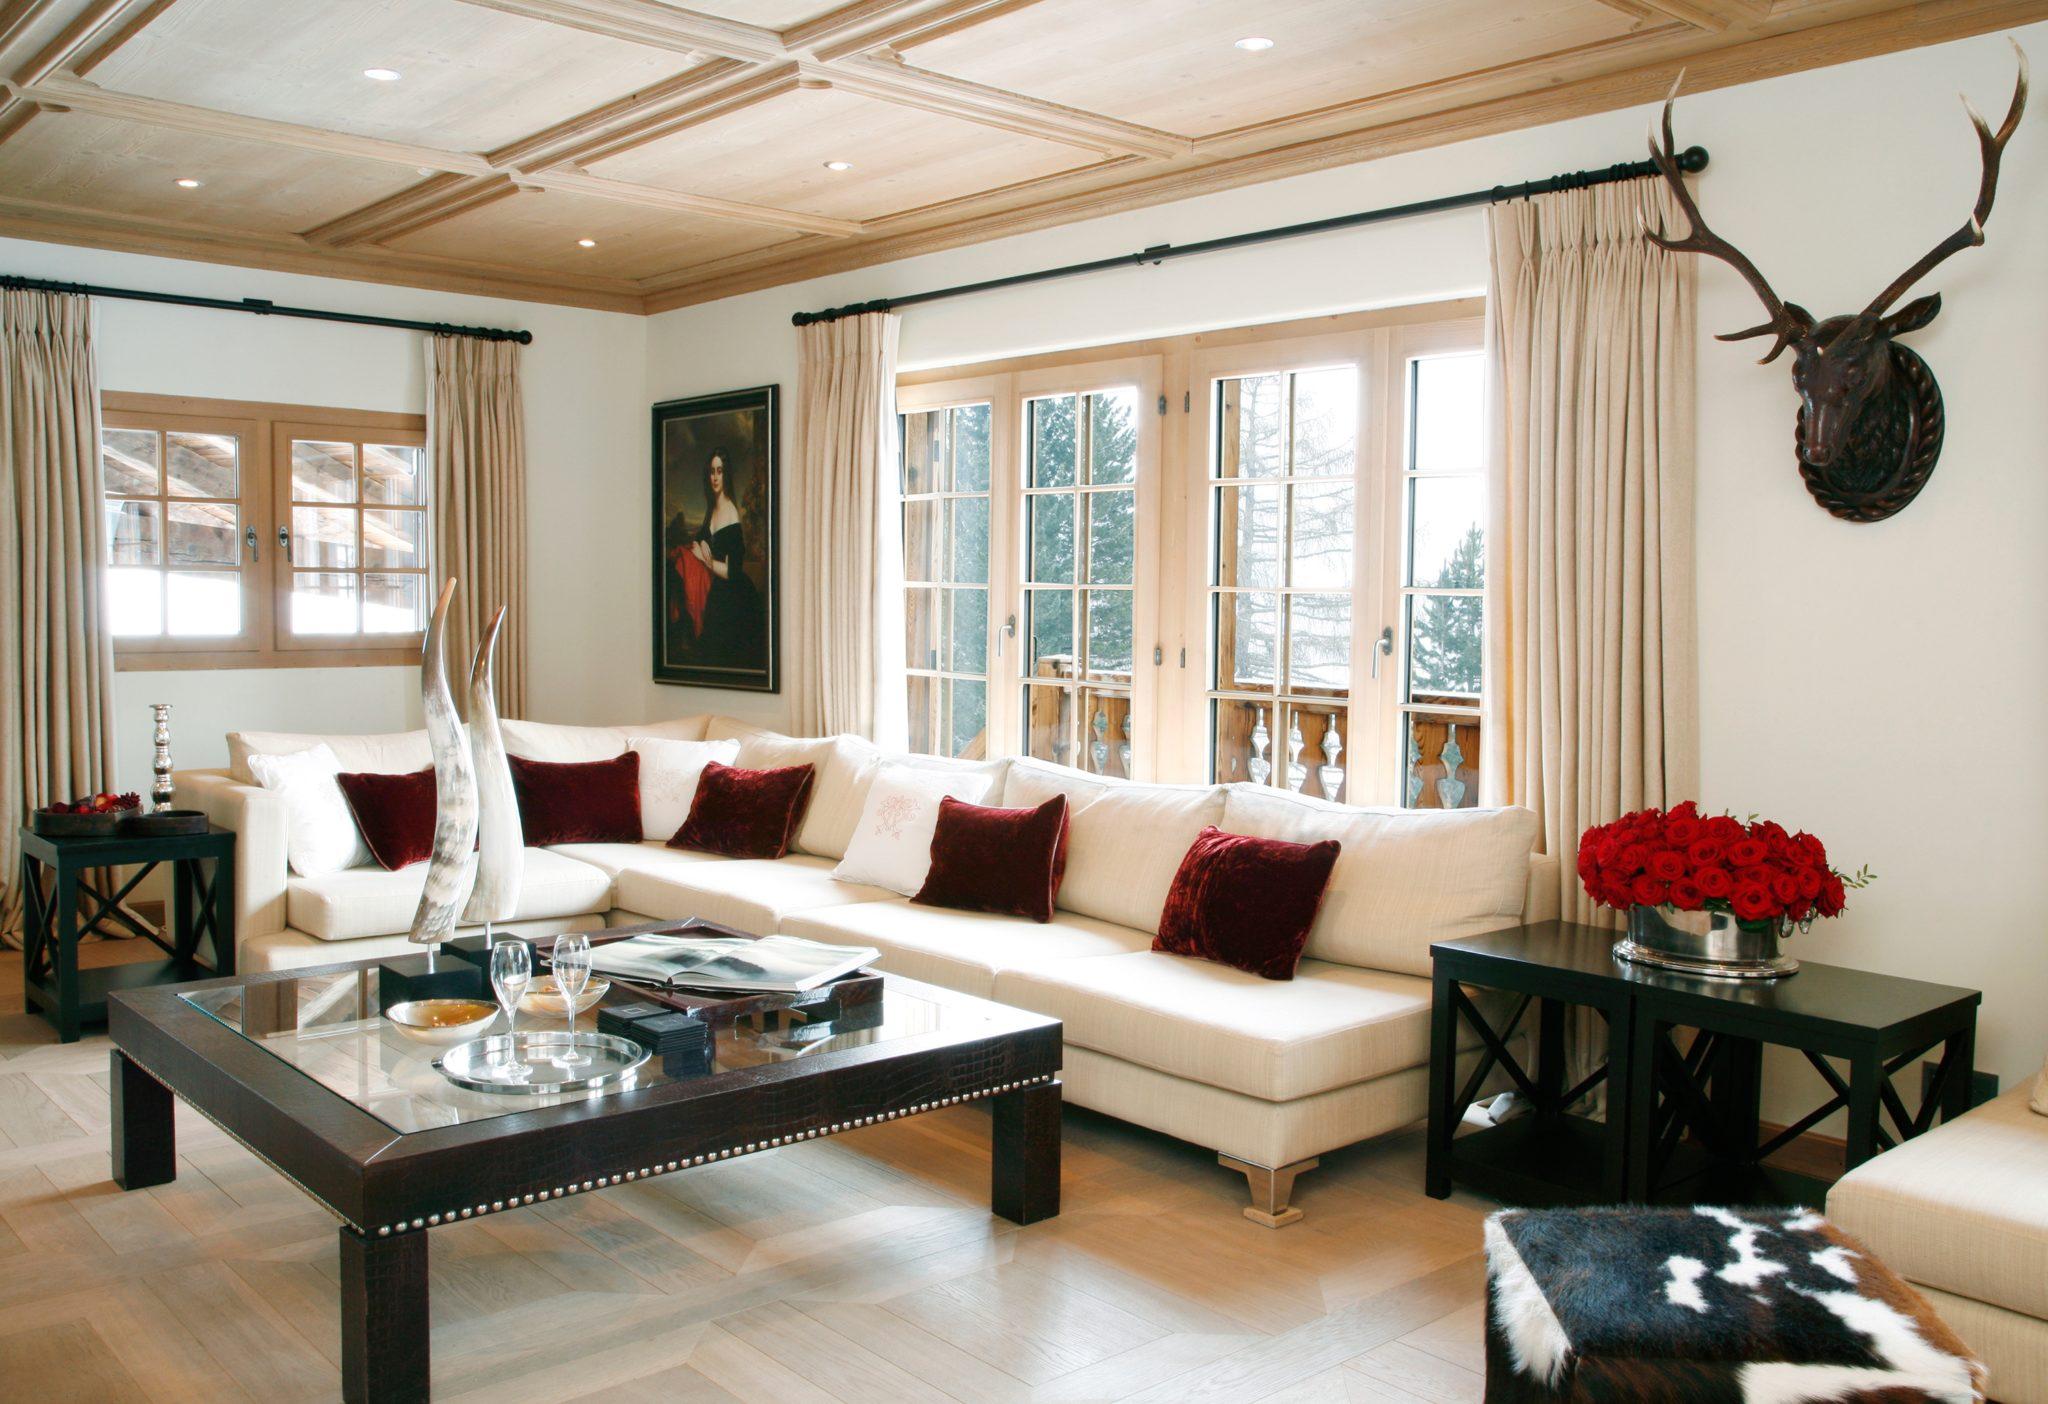 Interior design byVSP Interiors